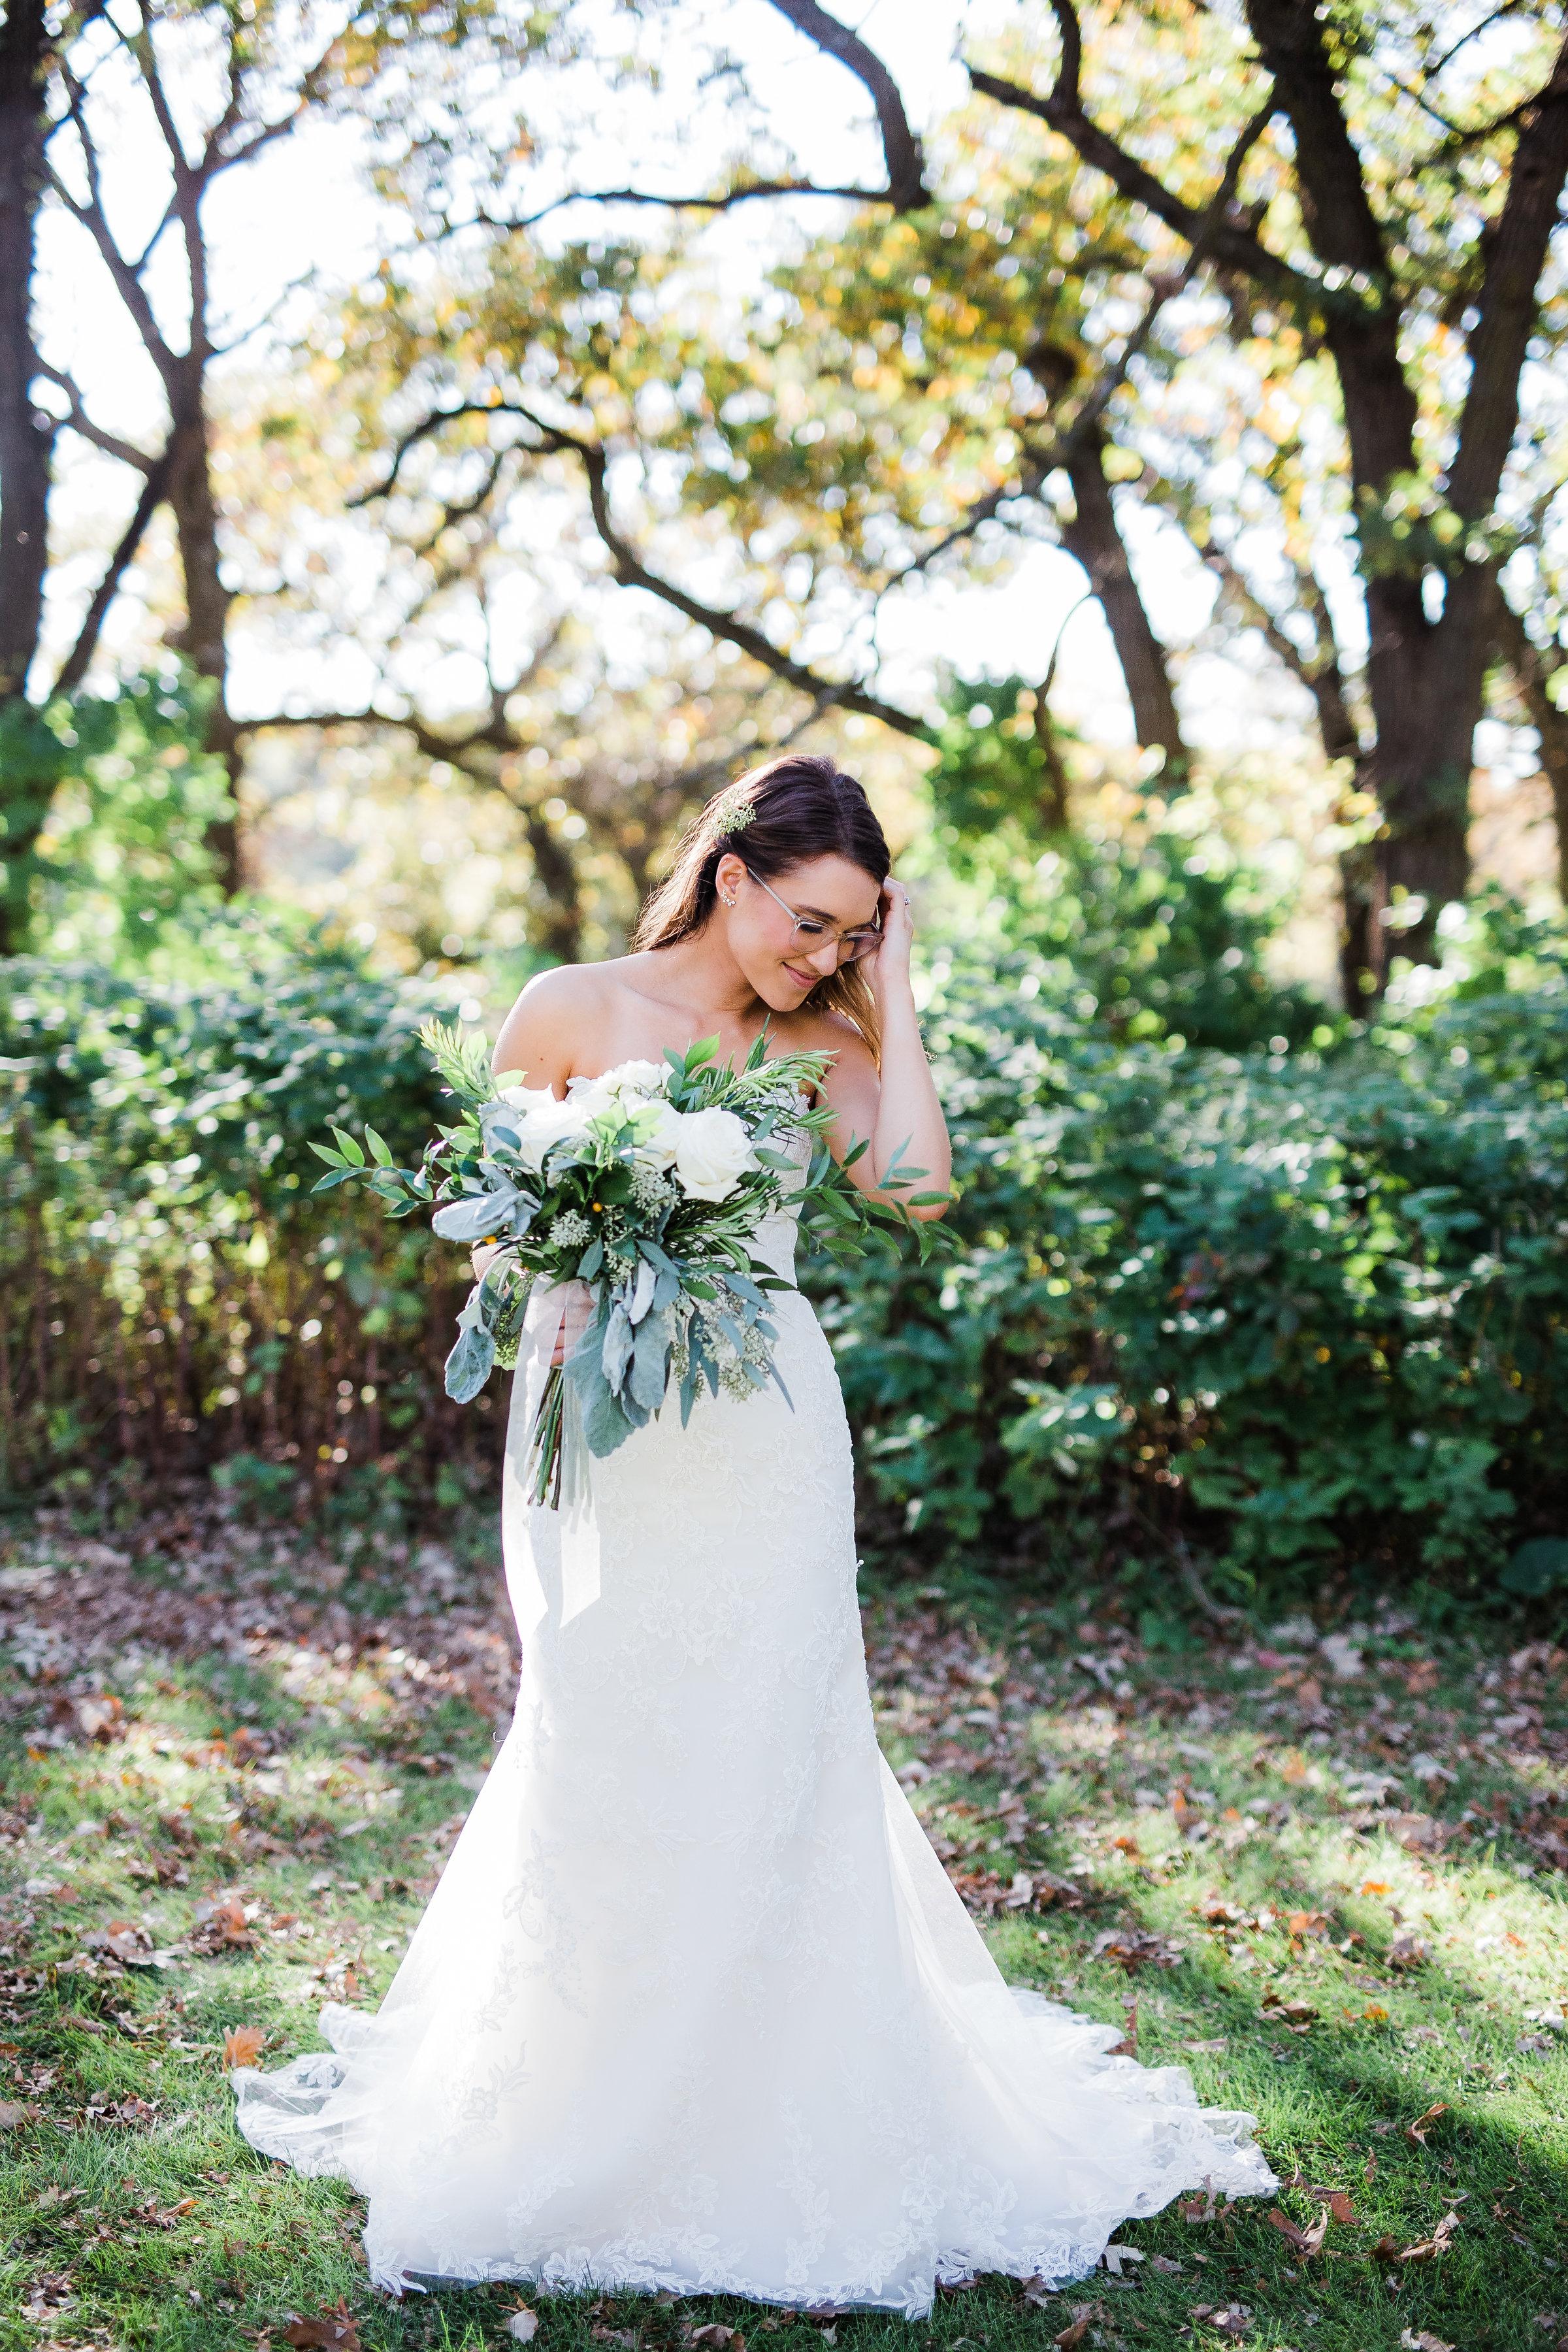 Beautiful bride portraits traveling wedding photographers Minneapolis MN